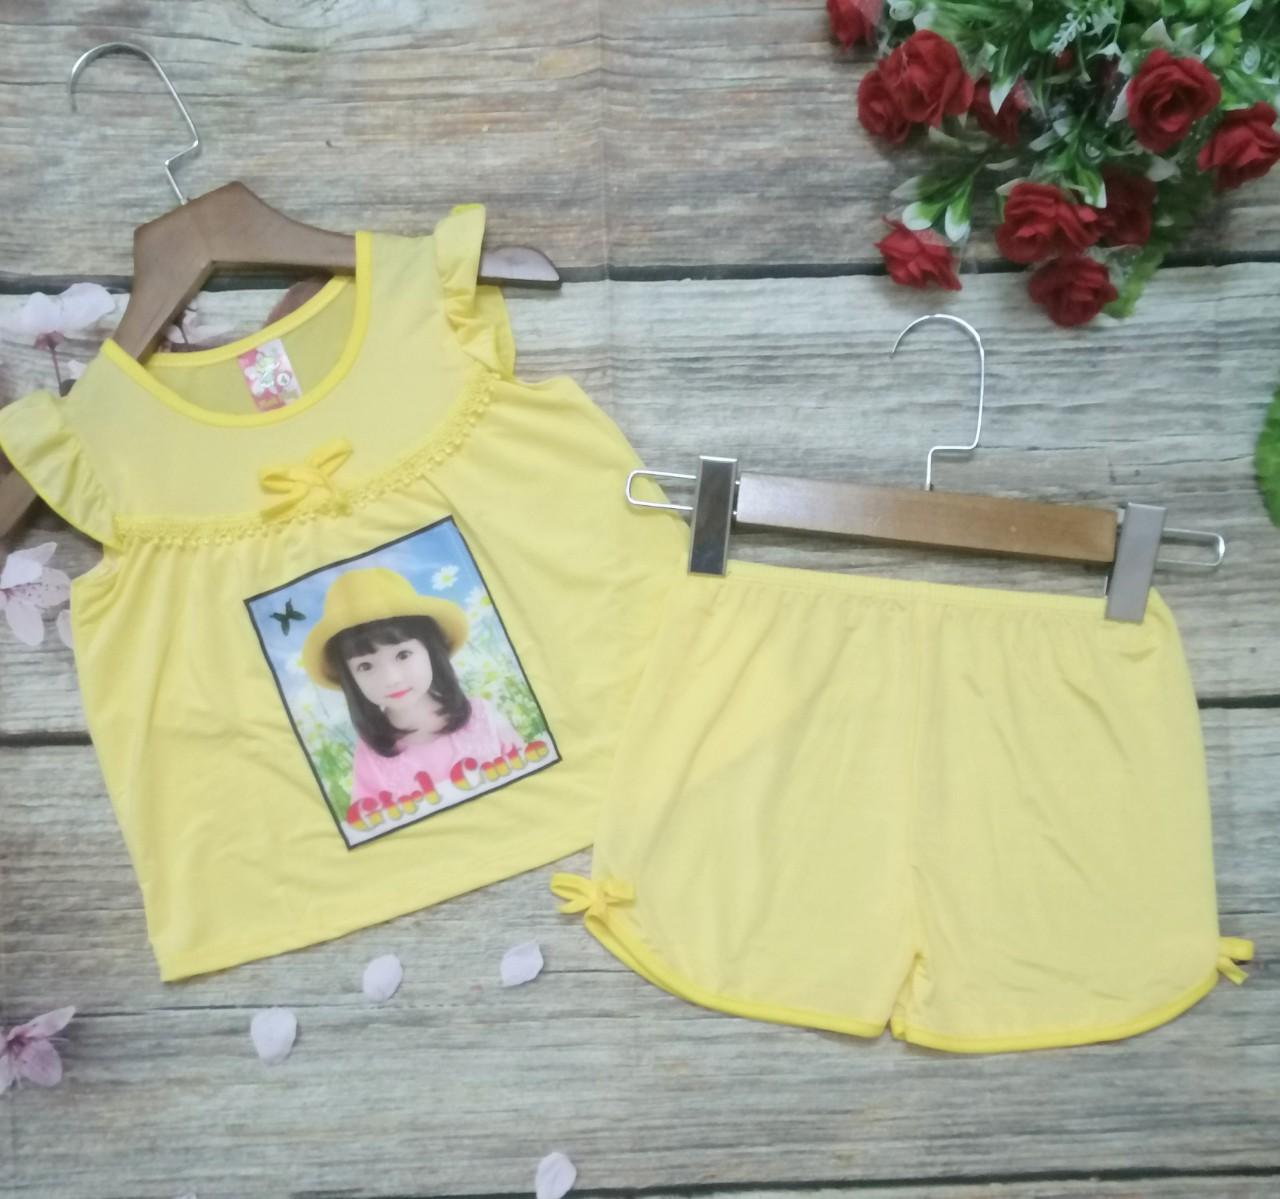 100k COMBO 3 BỘ 3 MẪU quần áo bé gái, đồ bộ cho bé gái 1-3 tuổi, đồ bộ thun lạnh bé gái NOVA SHOP